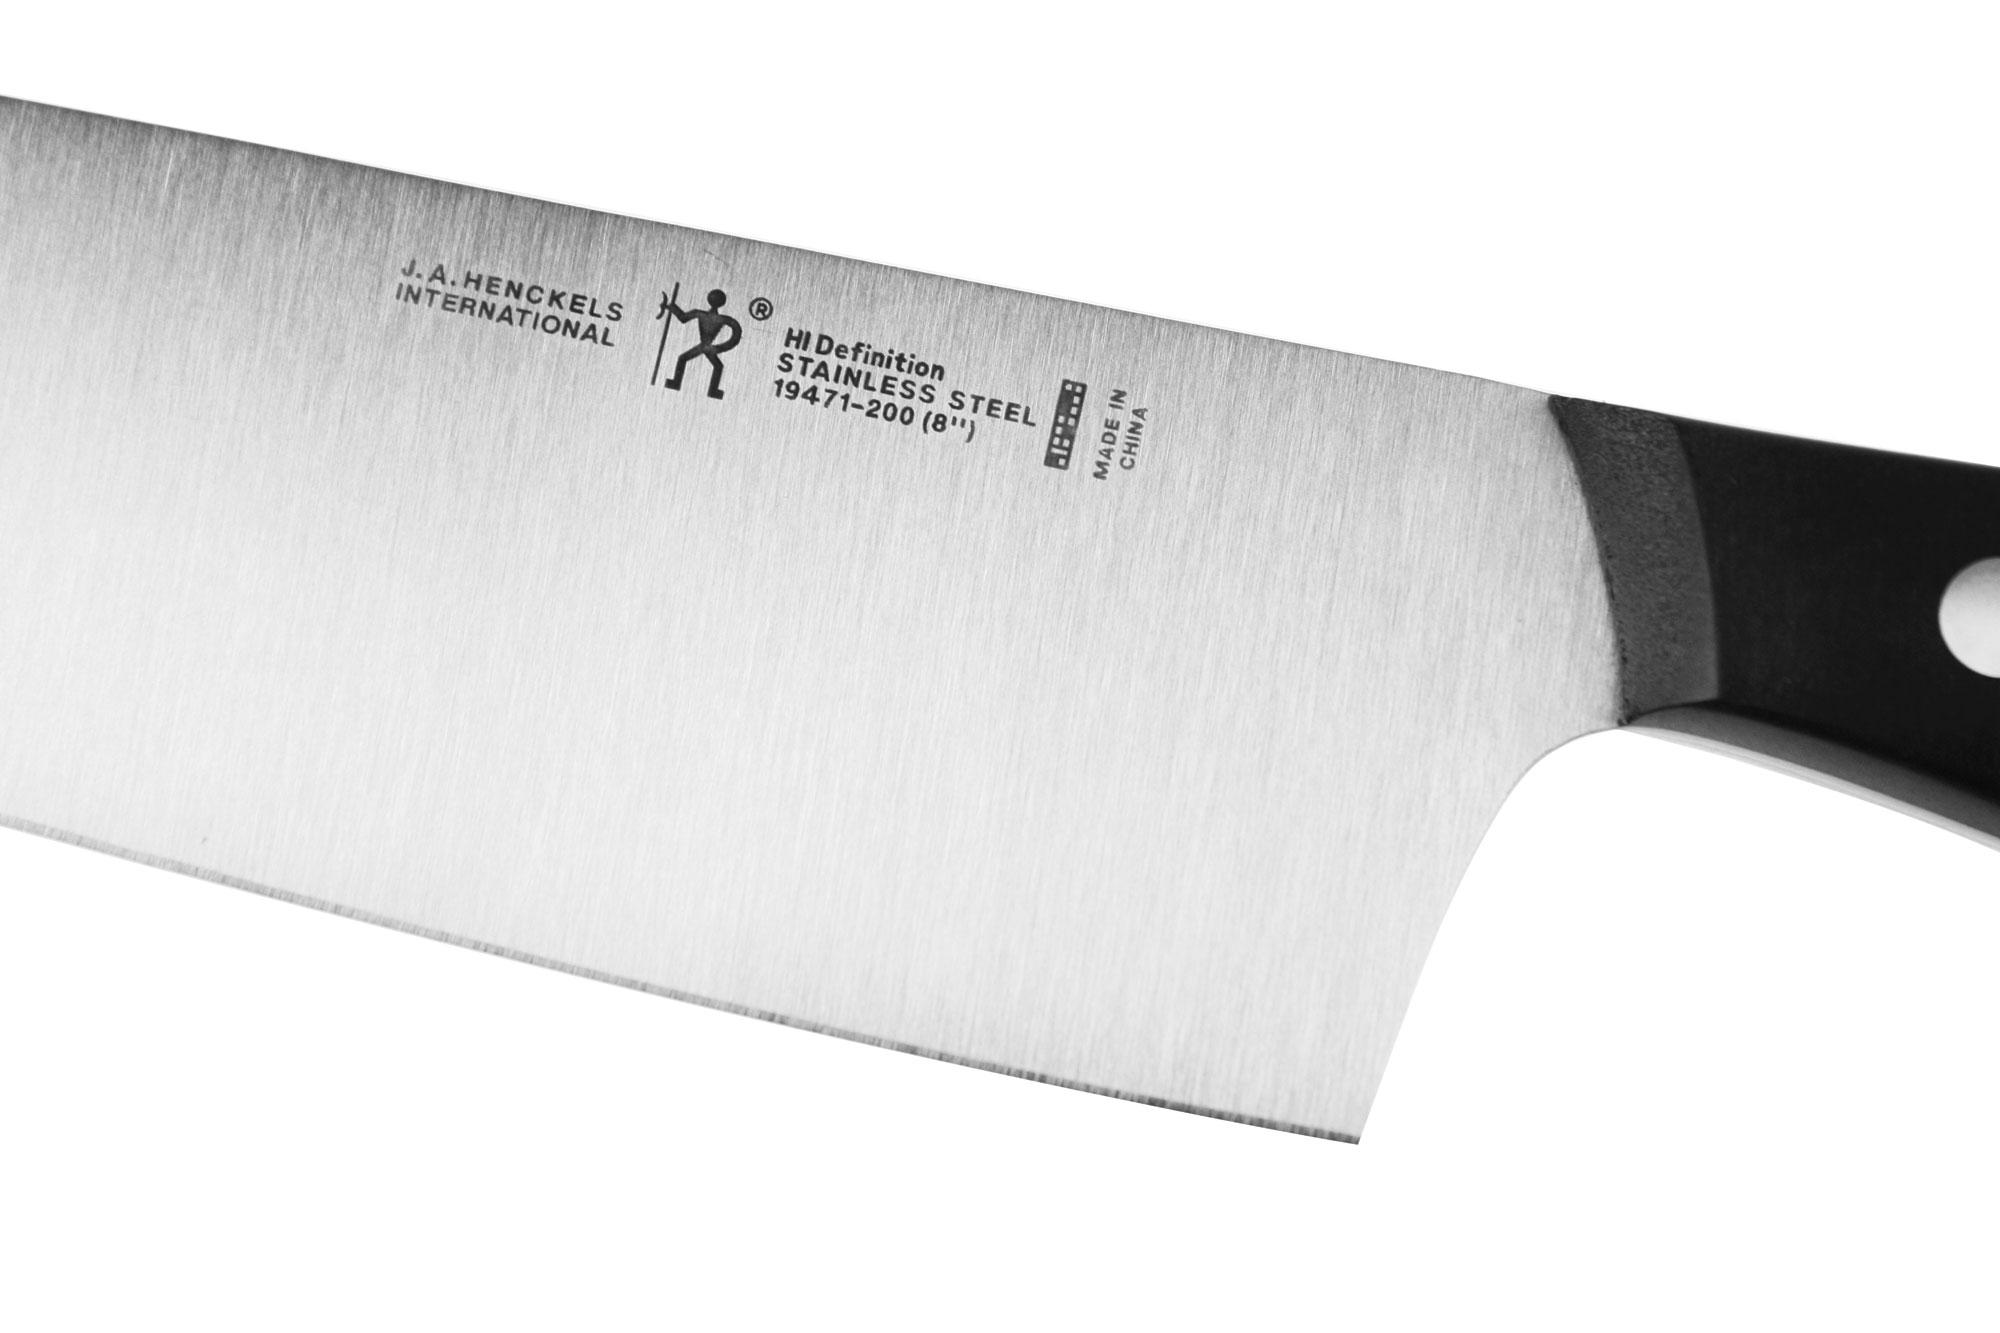 henckels international definition 9 piece knife block set cutlery and more. Black Bedroom Furniture Sets. Home Design Ideas